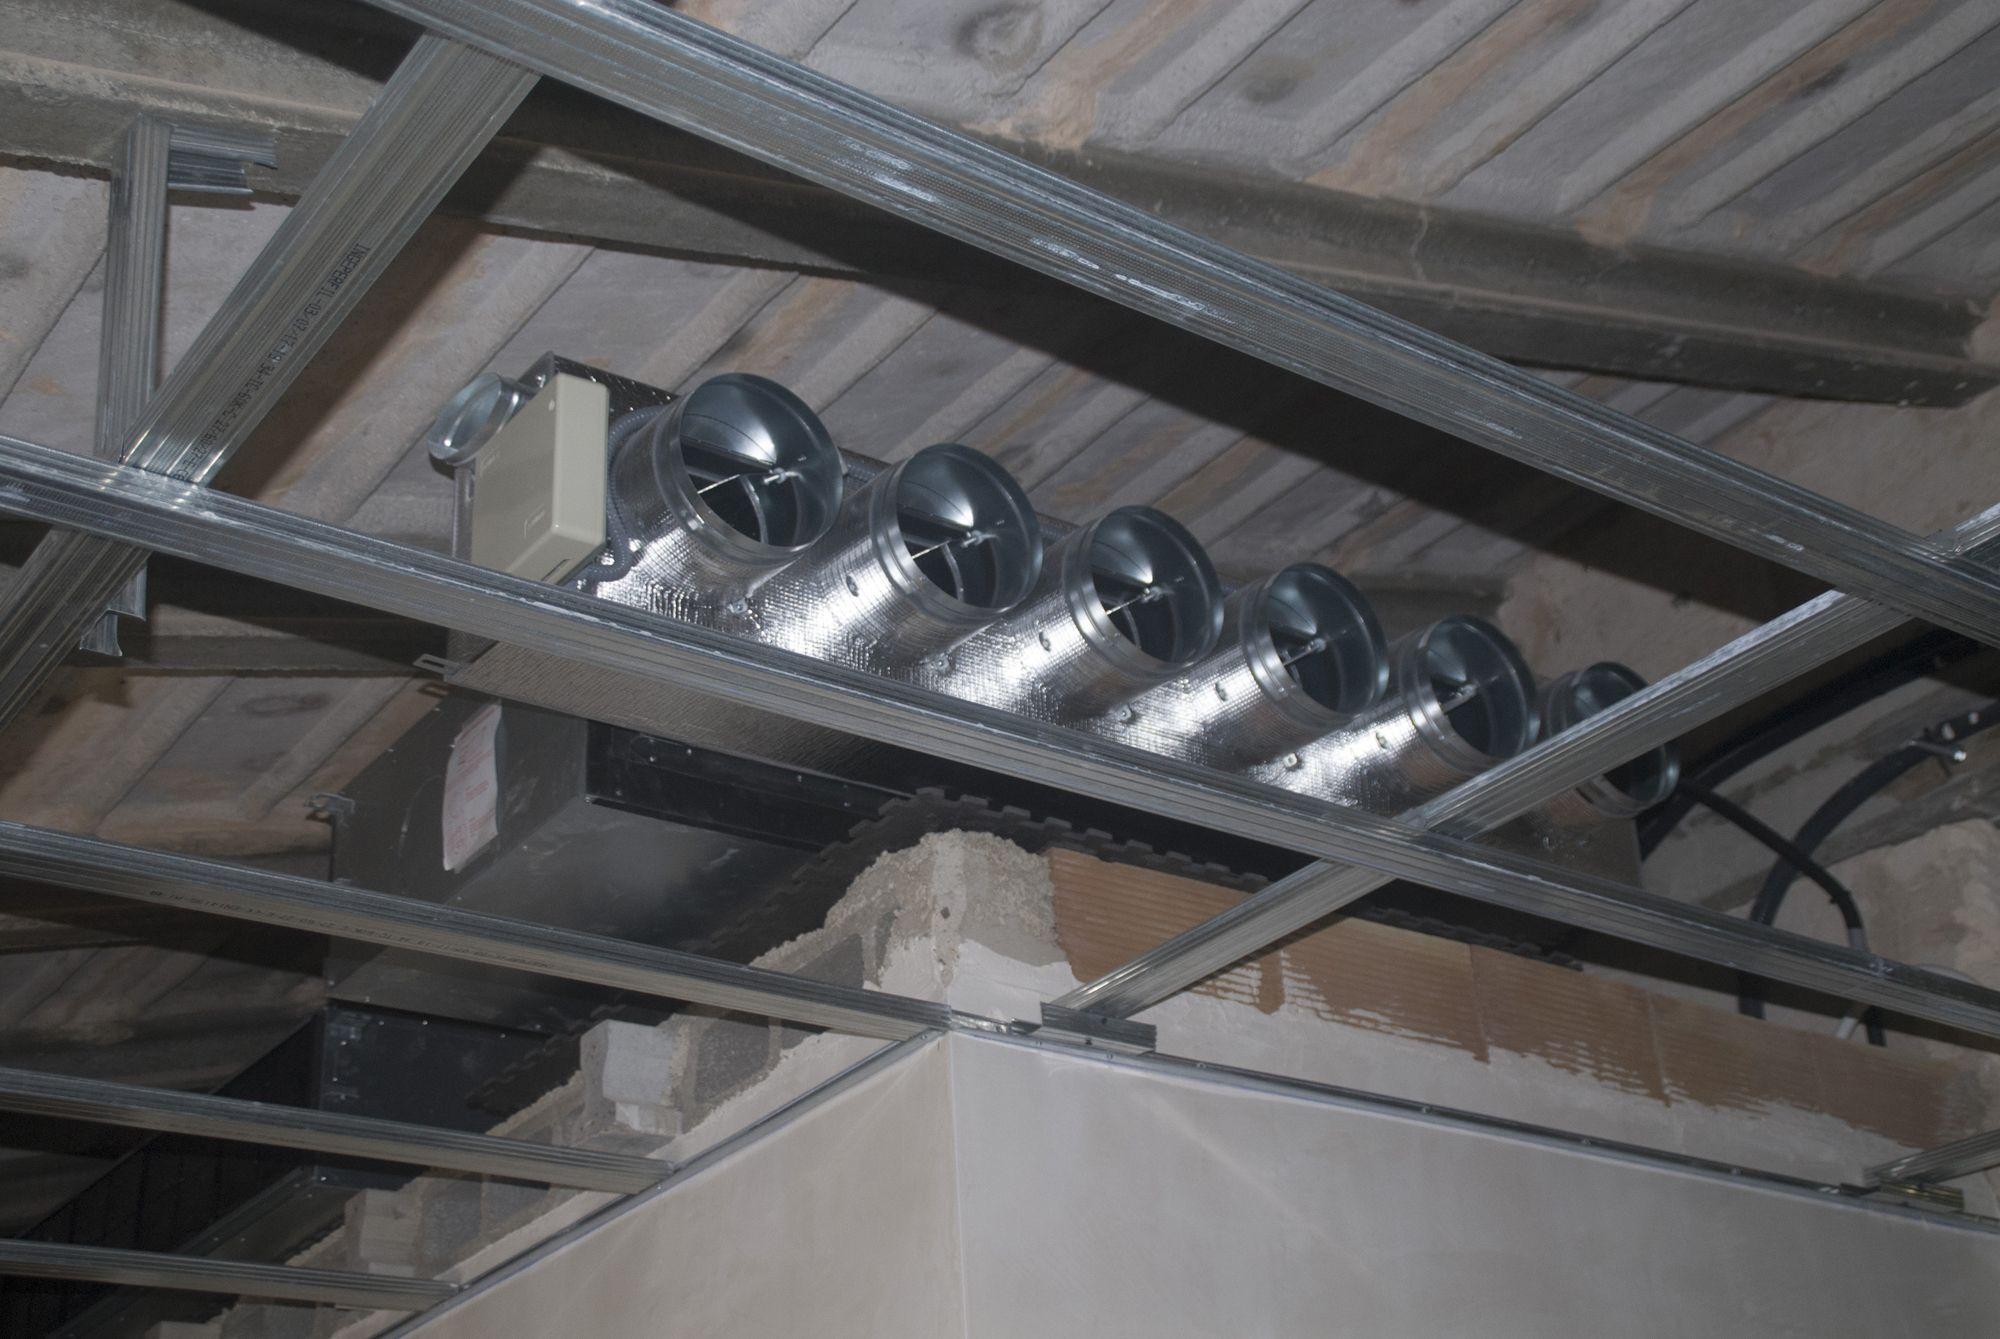 Instalaciones de sistemas de climatización en Palma de Mallorca